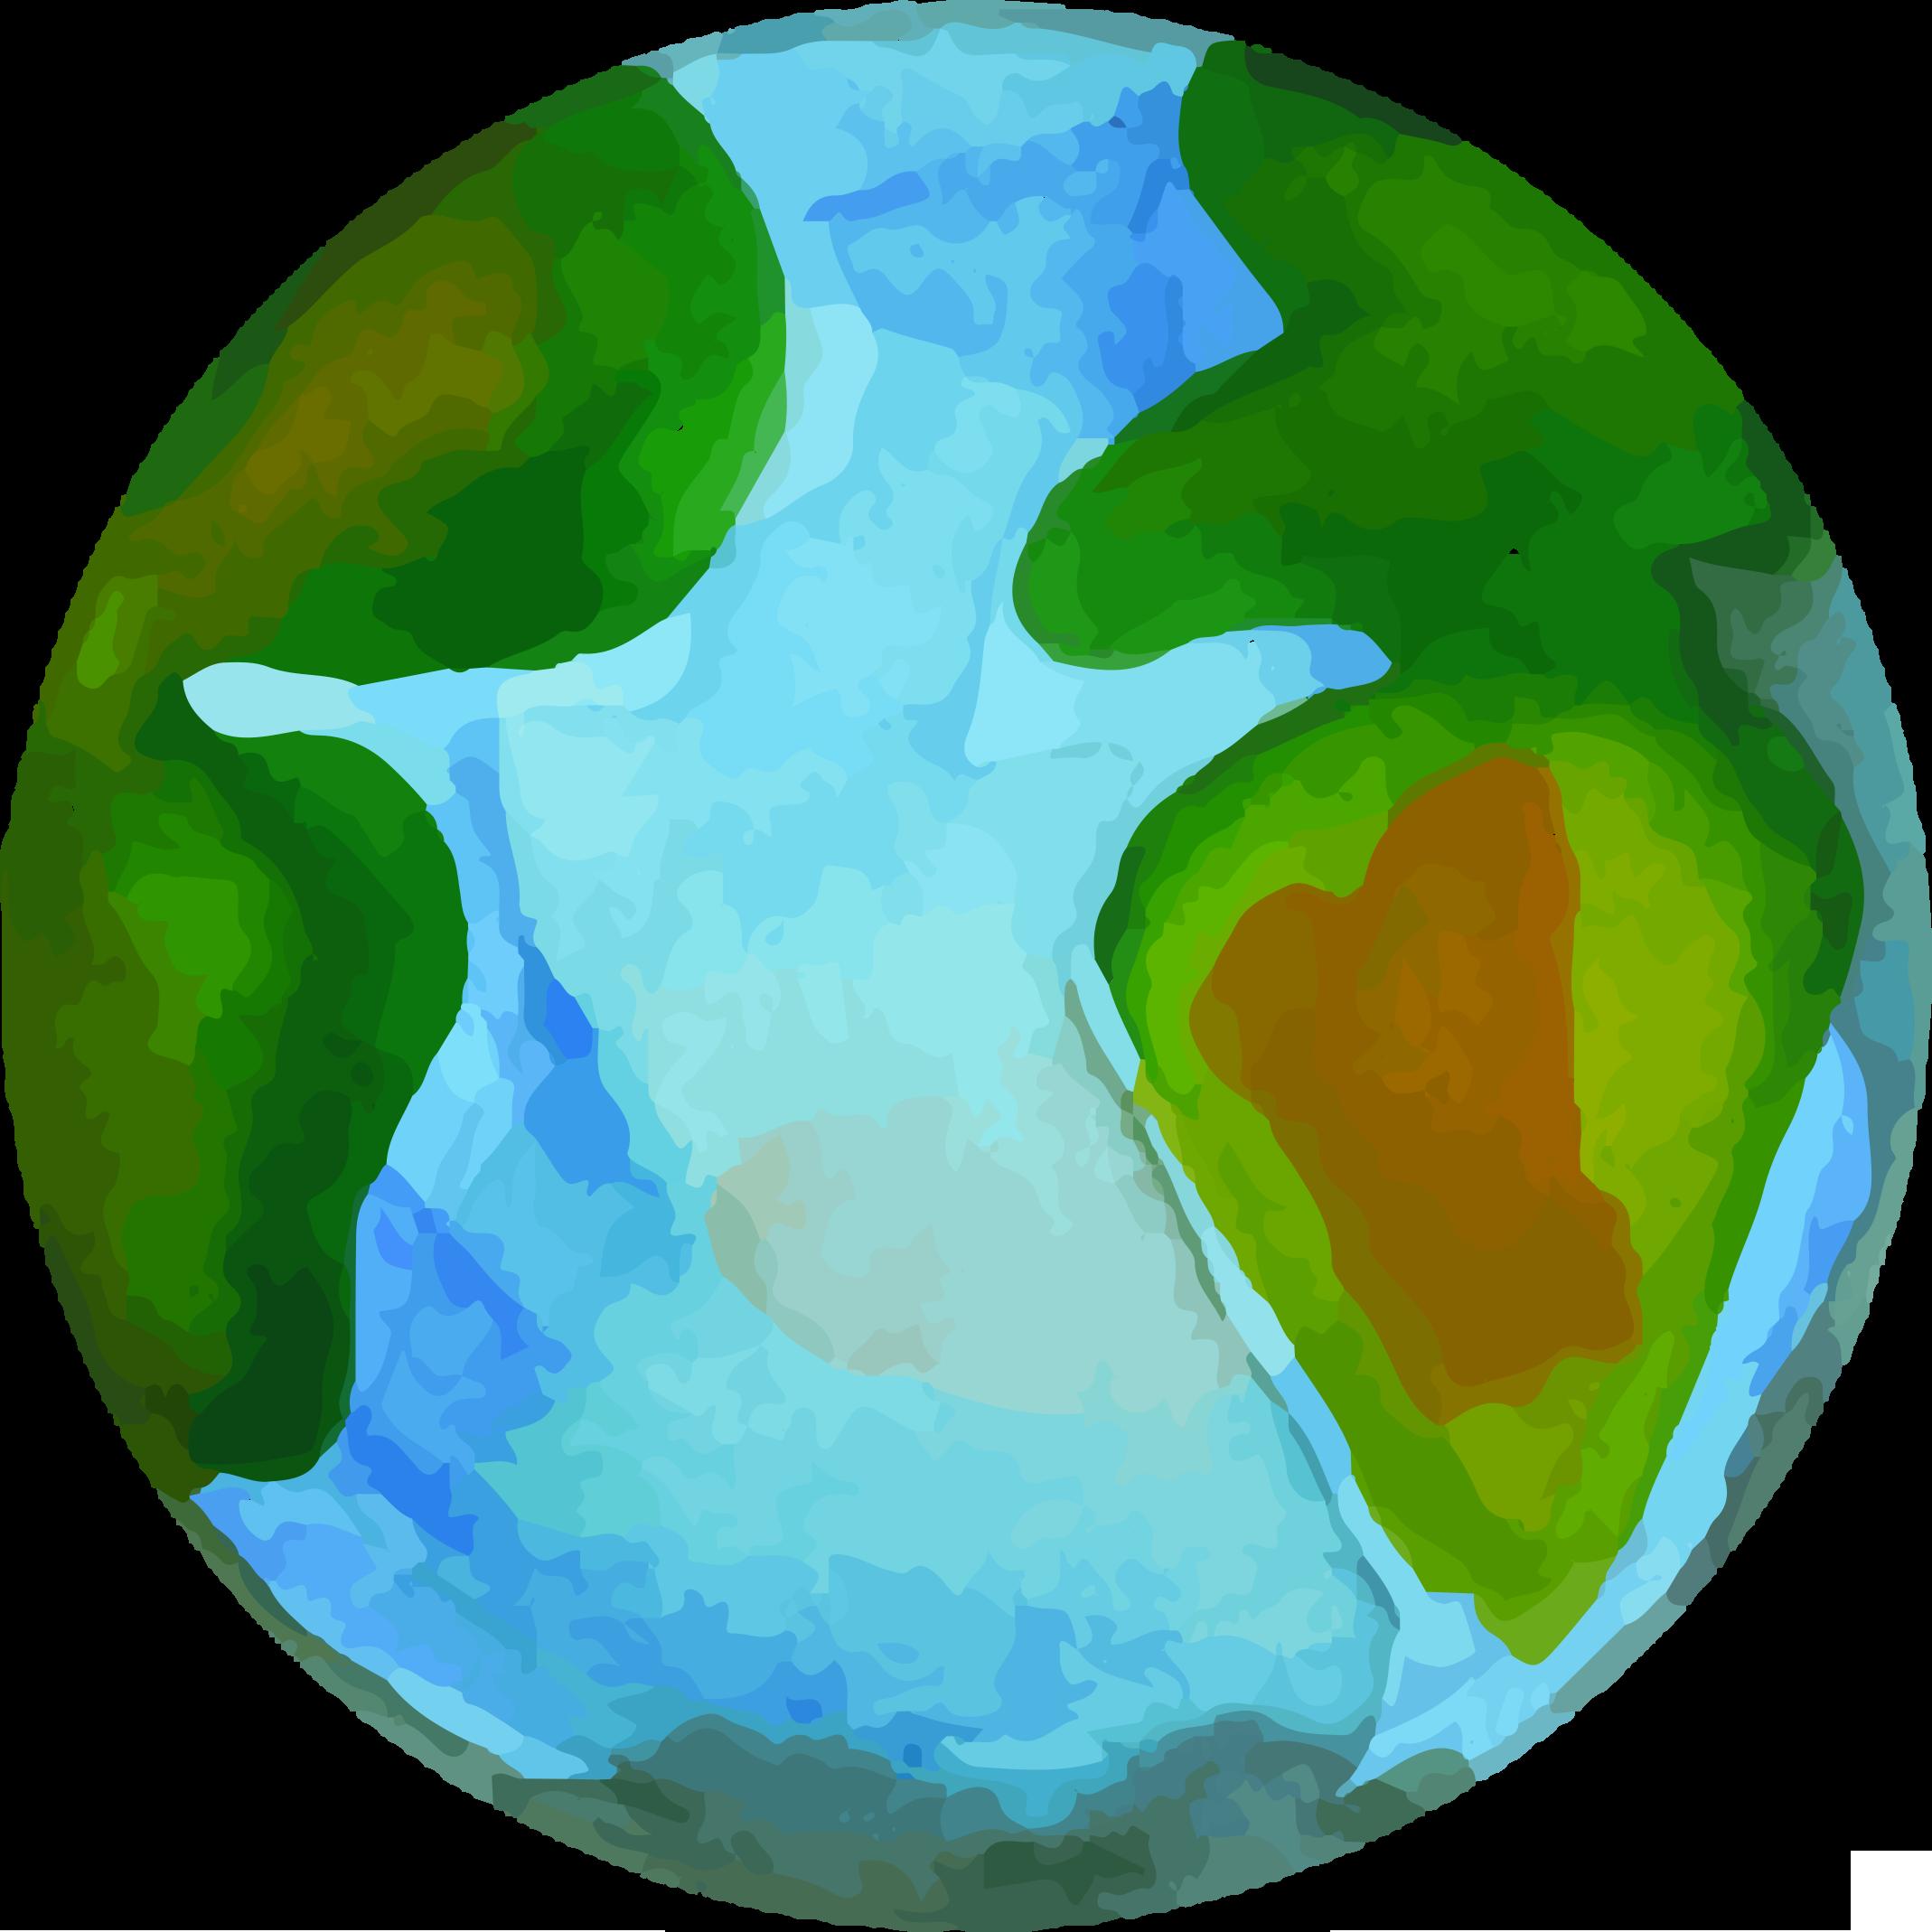 Around the world with IASP